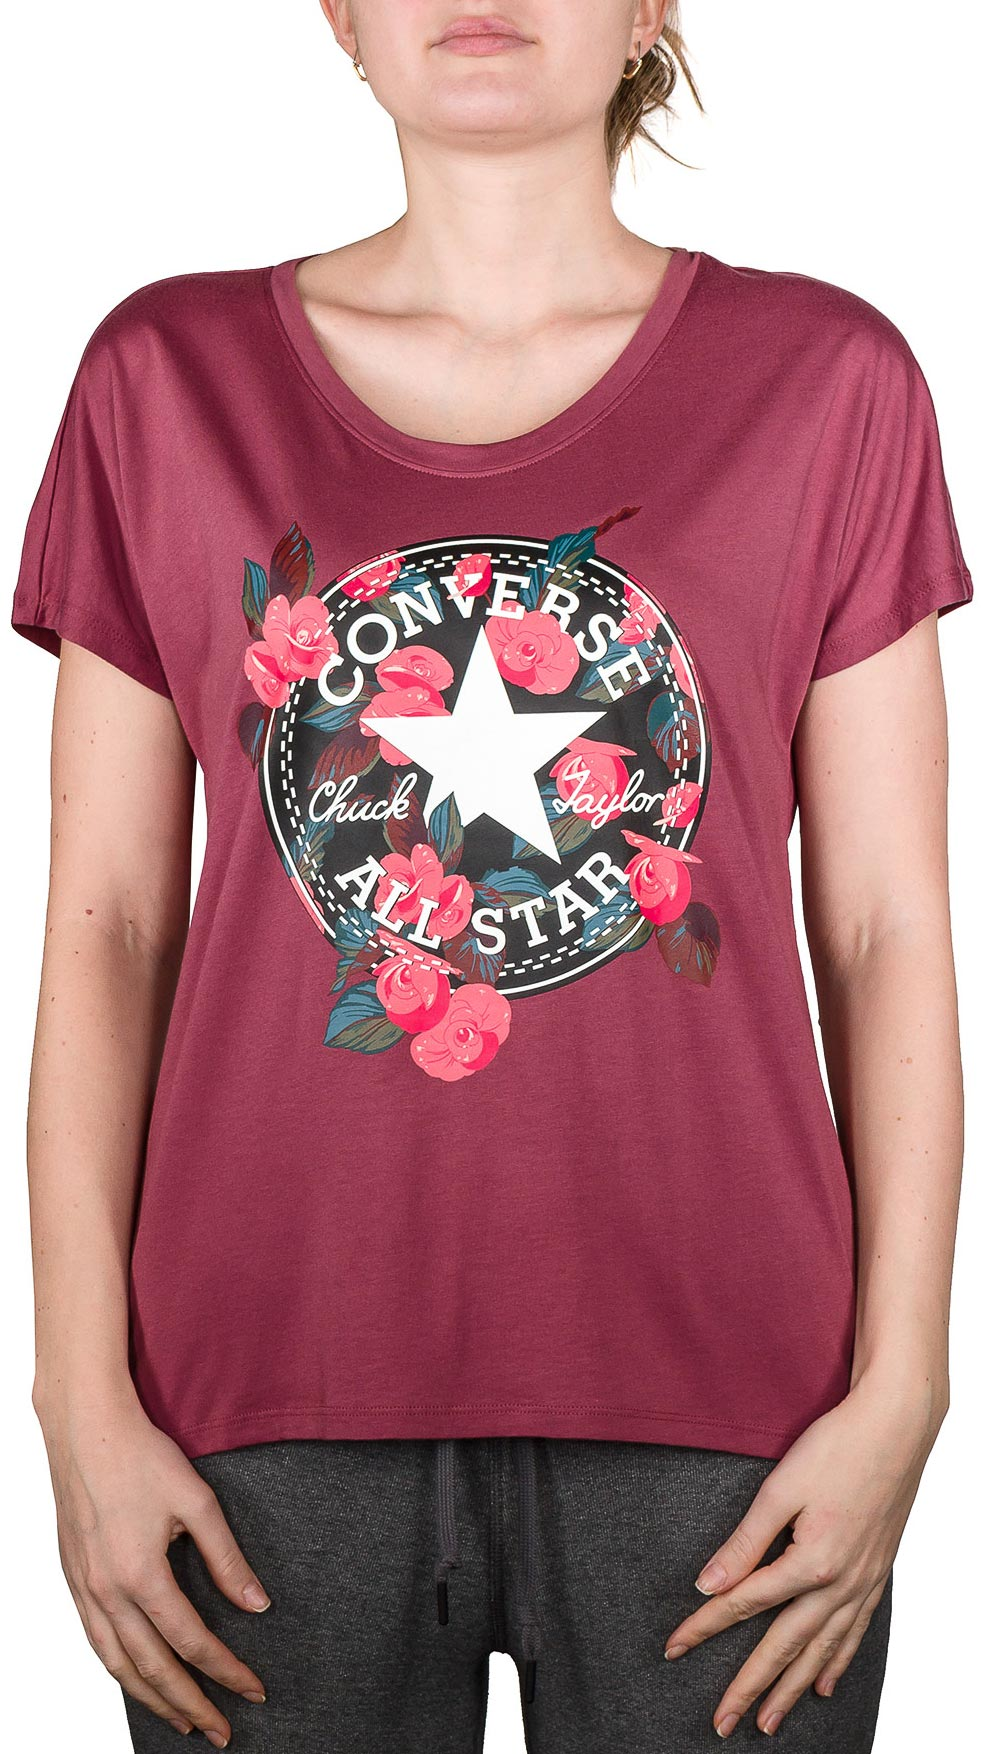 997ed9e2d01 Converse FLORAL CP FEMME TEE. Dámské tričko. Dámské tričko